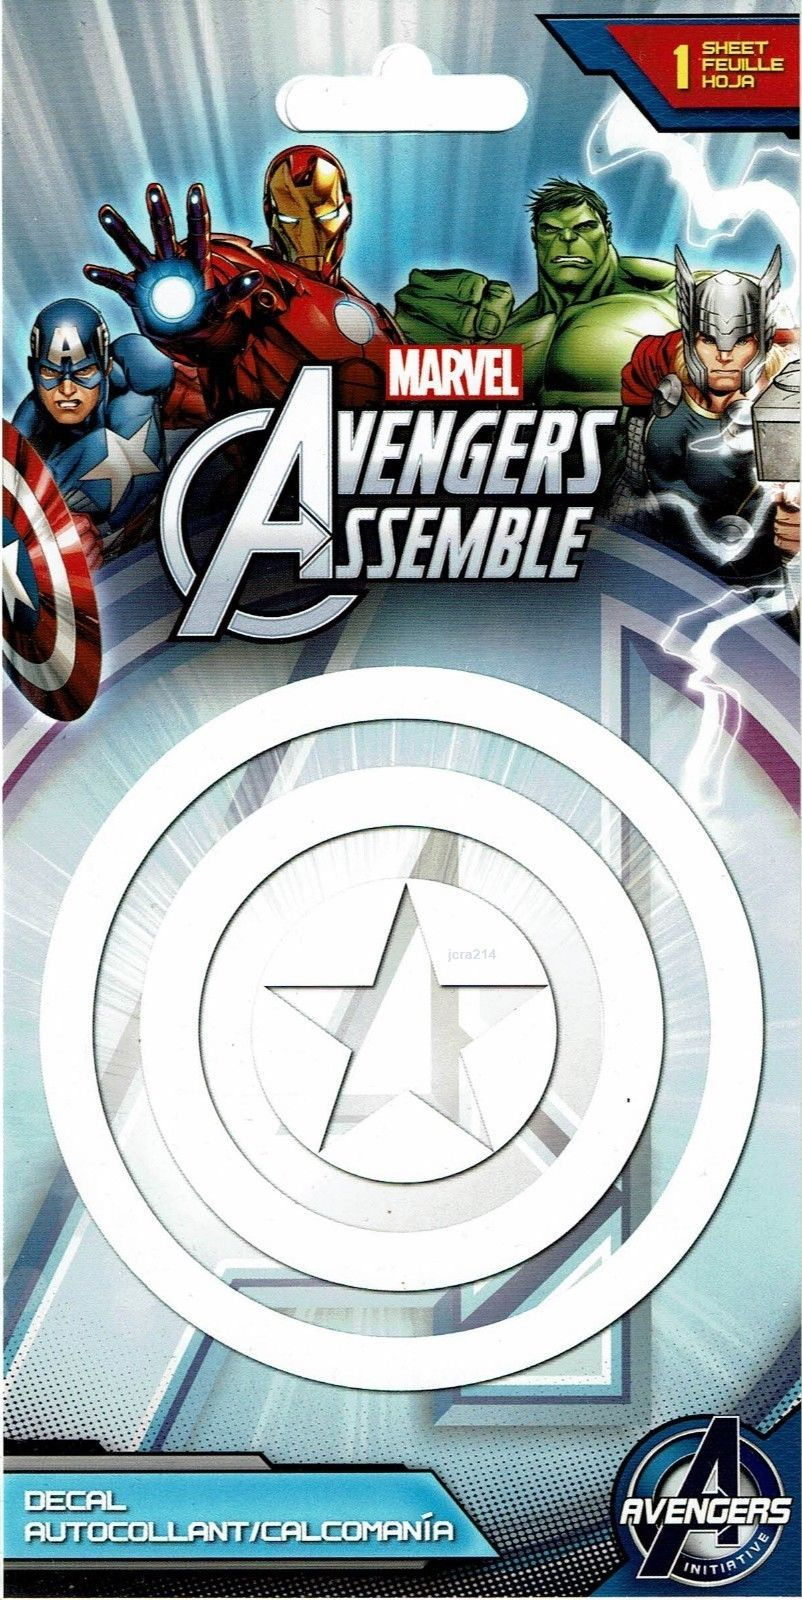 Sandylion Marvel Avengers Assemble Sticker Auto Window Decal Dc7659 Infinity War Ebay Marvel Avengers Assemble Marvel Avengers Avengers Assemble [ 1600 x 802 Pixel ]